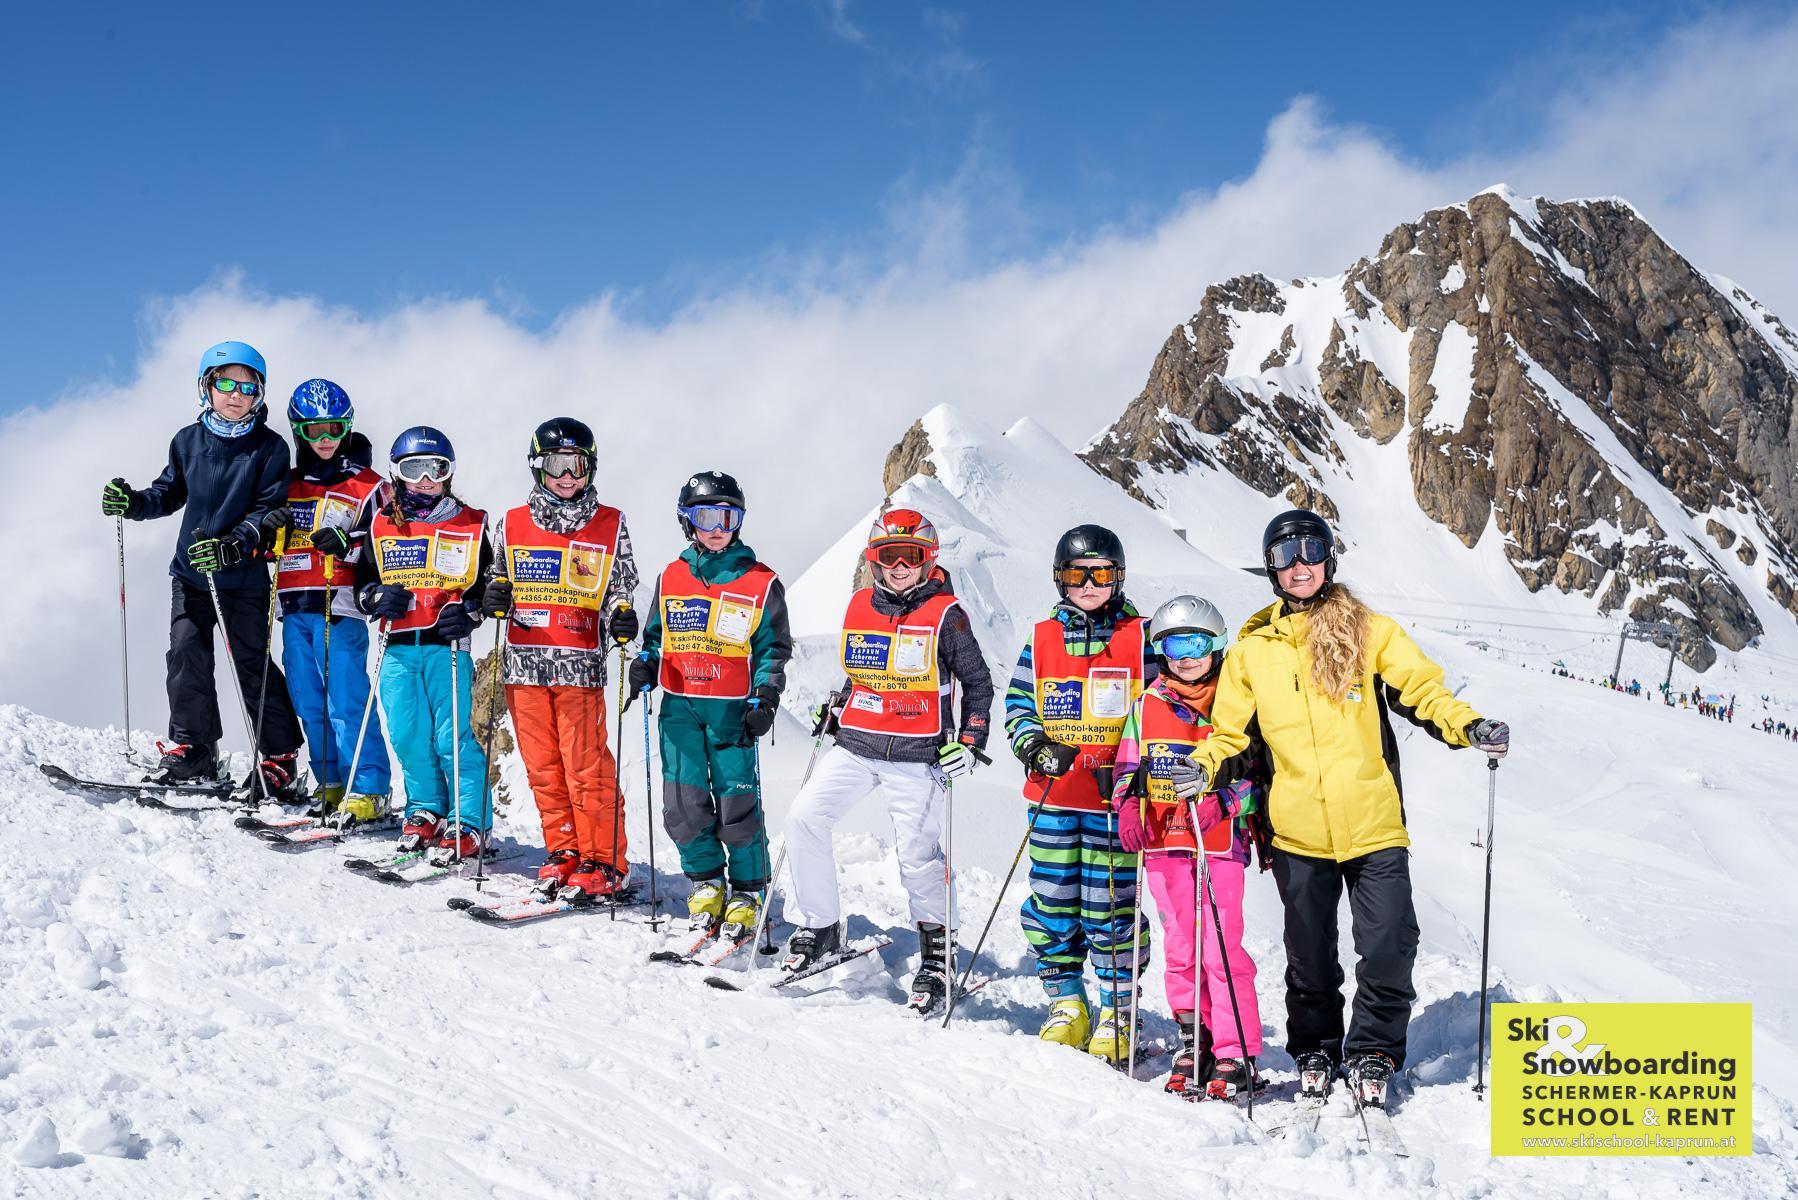 Kids Ski Lessons (3-15 y.) for Advanced Skiers